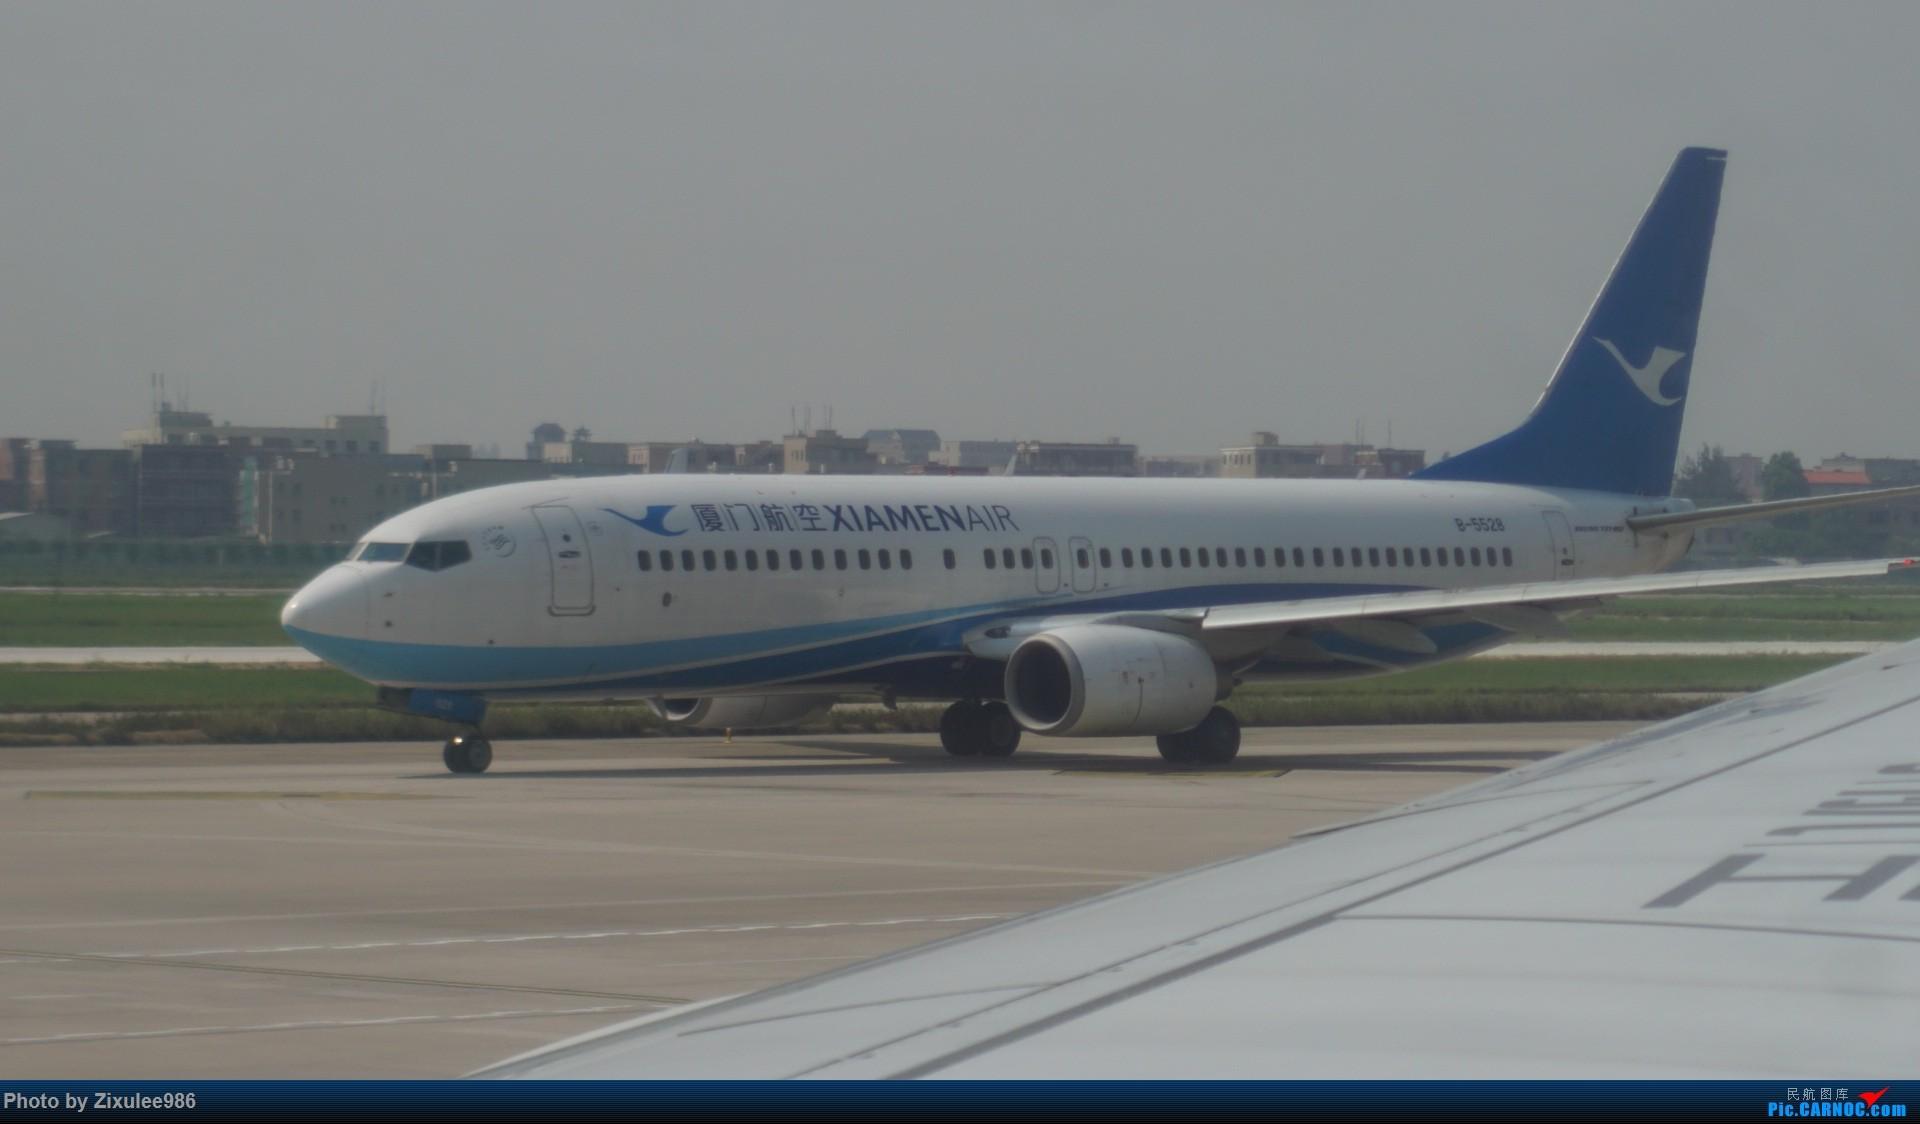 Re:[原创]加拿大21日游学之旅(一)~JJN-PVG-YYZ..全程都有flightlog~第一次发游记~缓更请谅解 BOEING 737-800 B-5528 中国泉州晋江国际机场